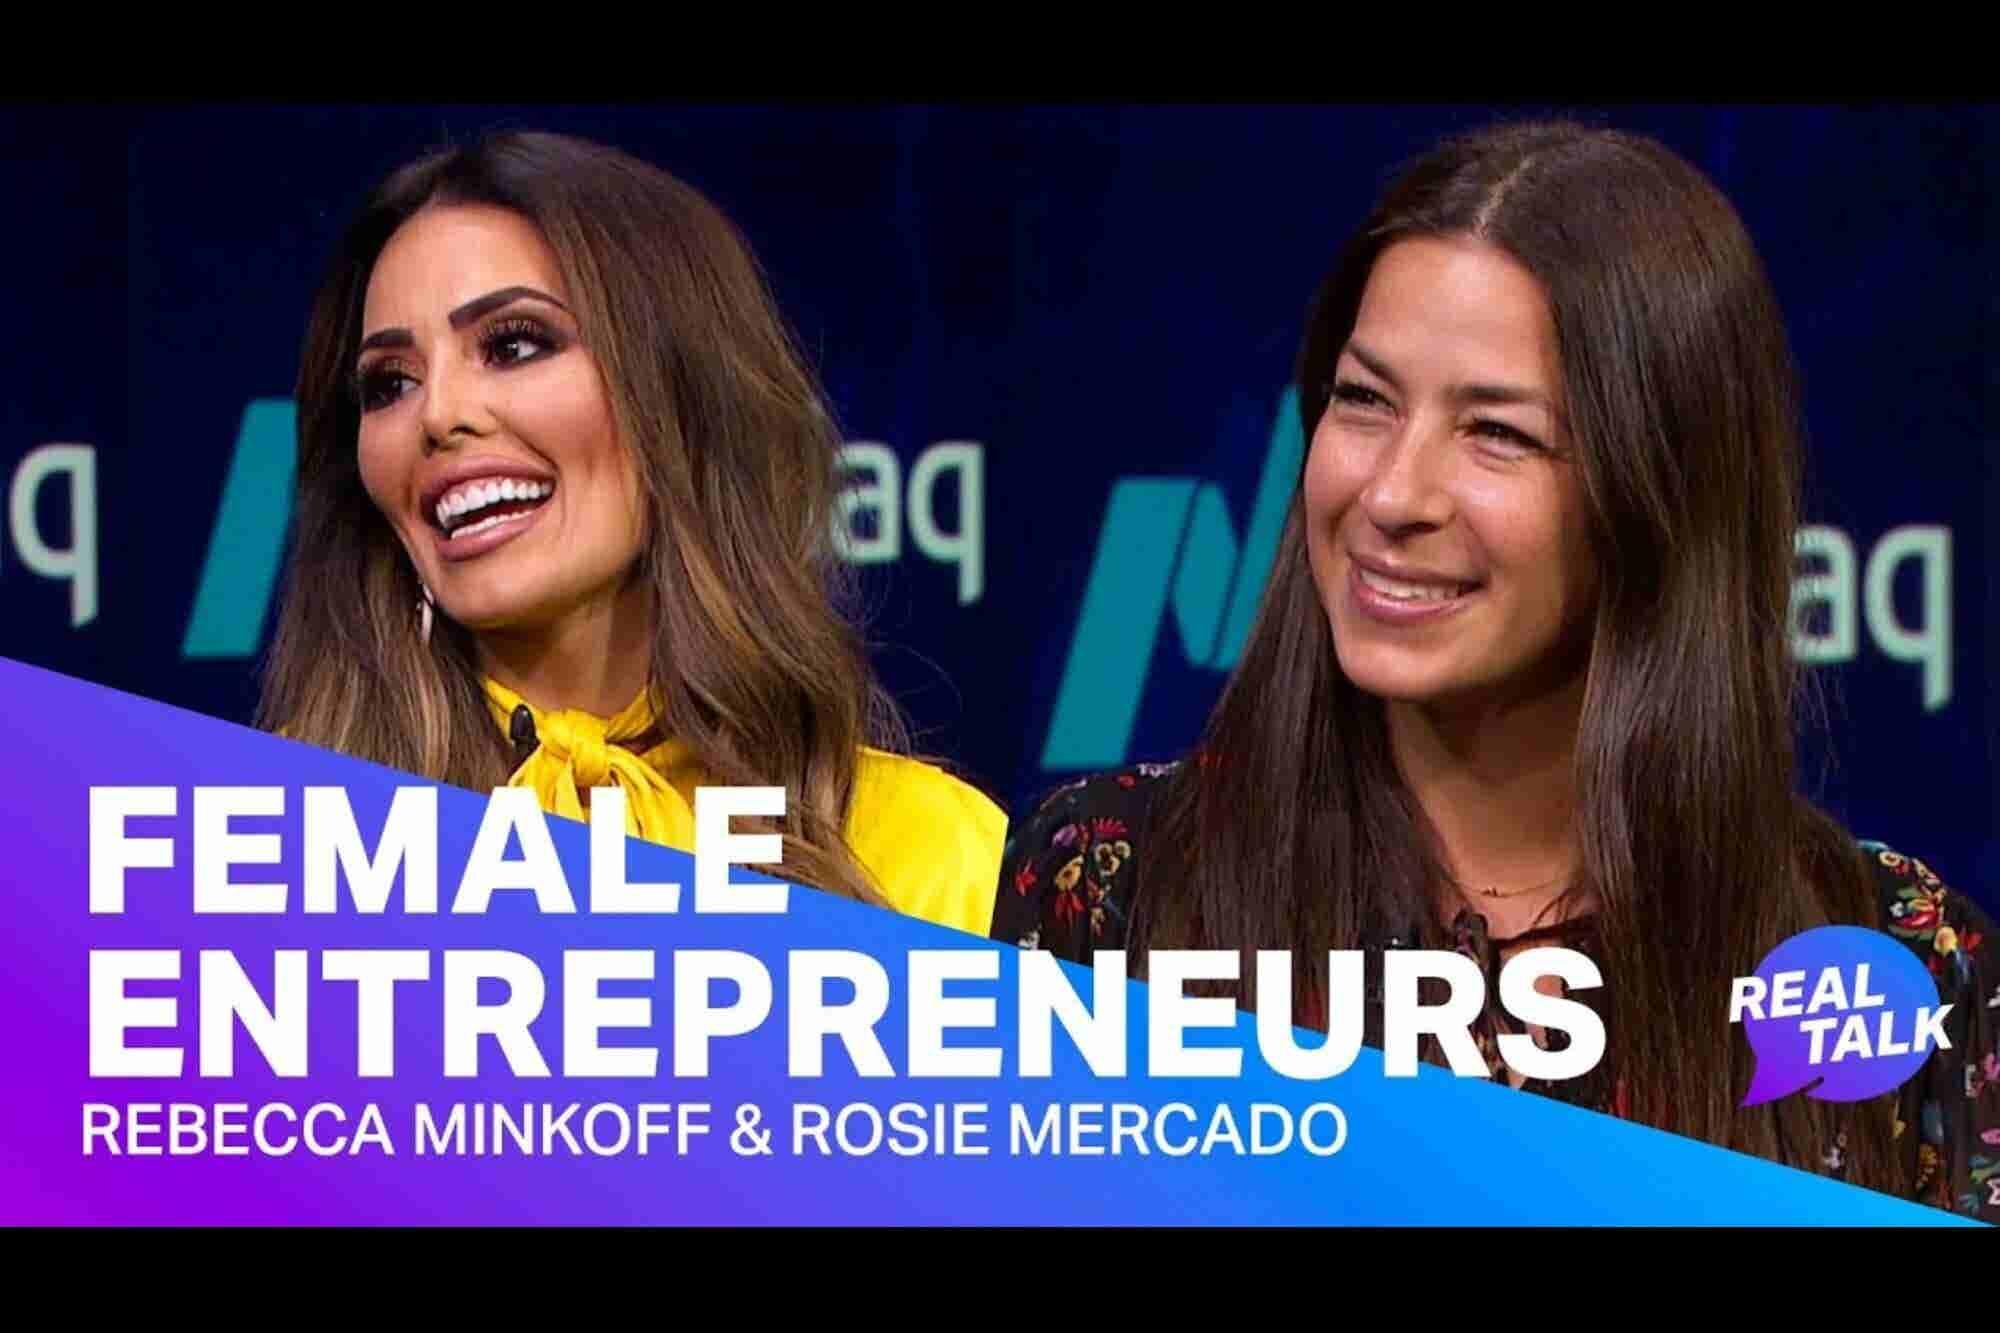 Inspiring Women Entrepreneurs Share Their Secrets to Success